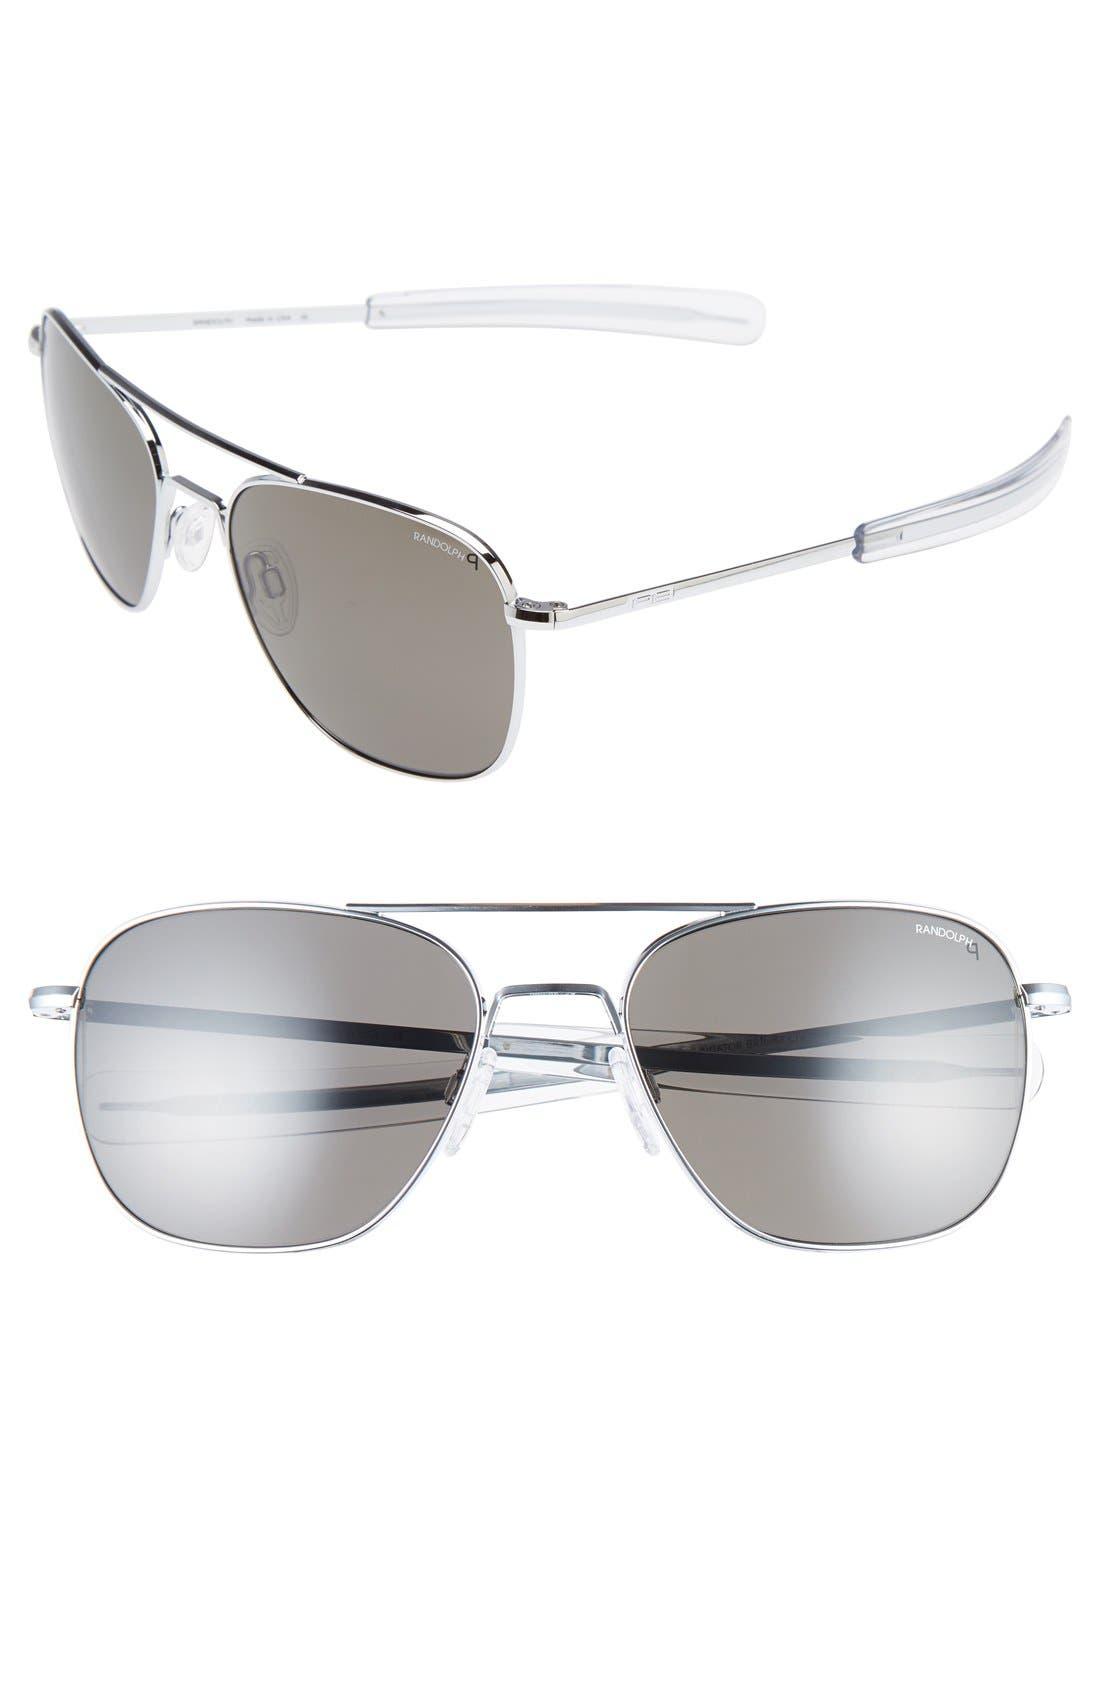 58mm Polarized Aviator Sunglasses,                         Main,                         color, 041